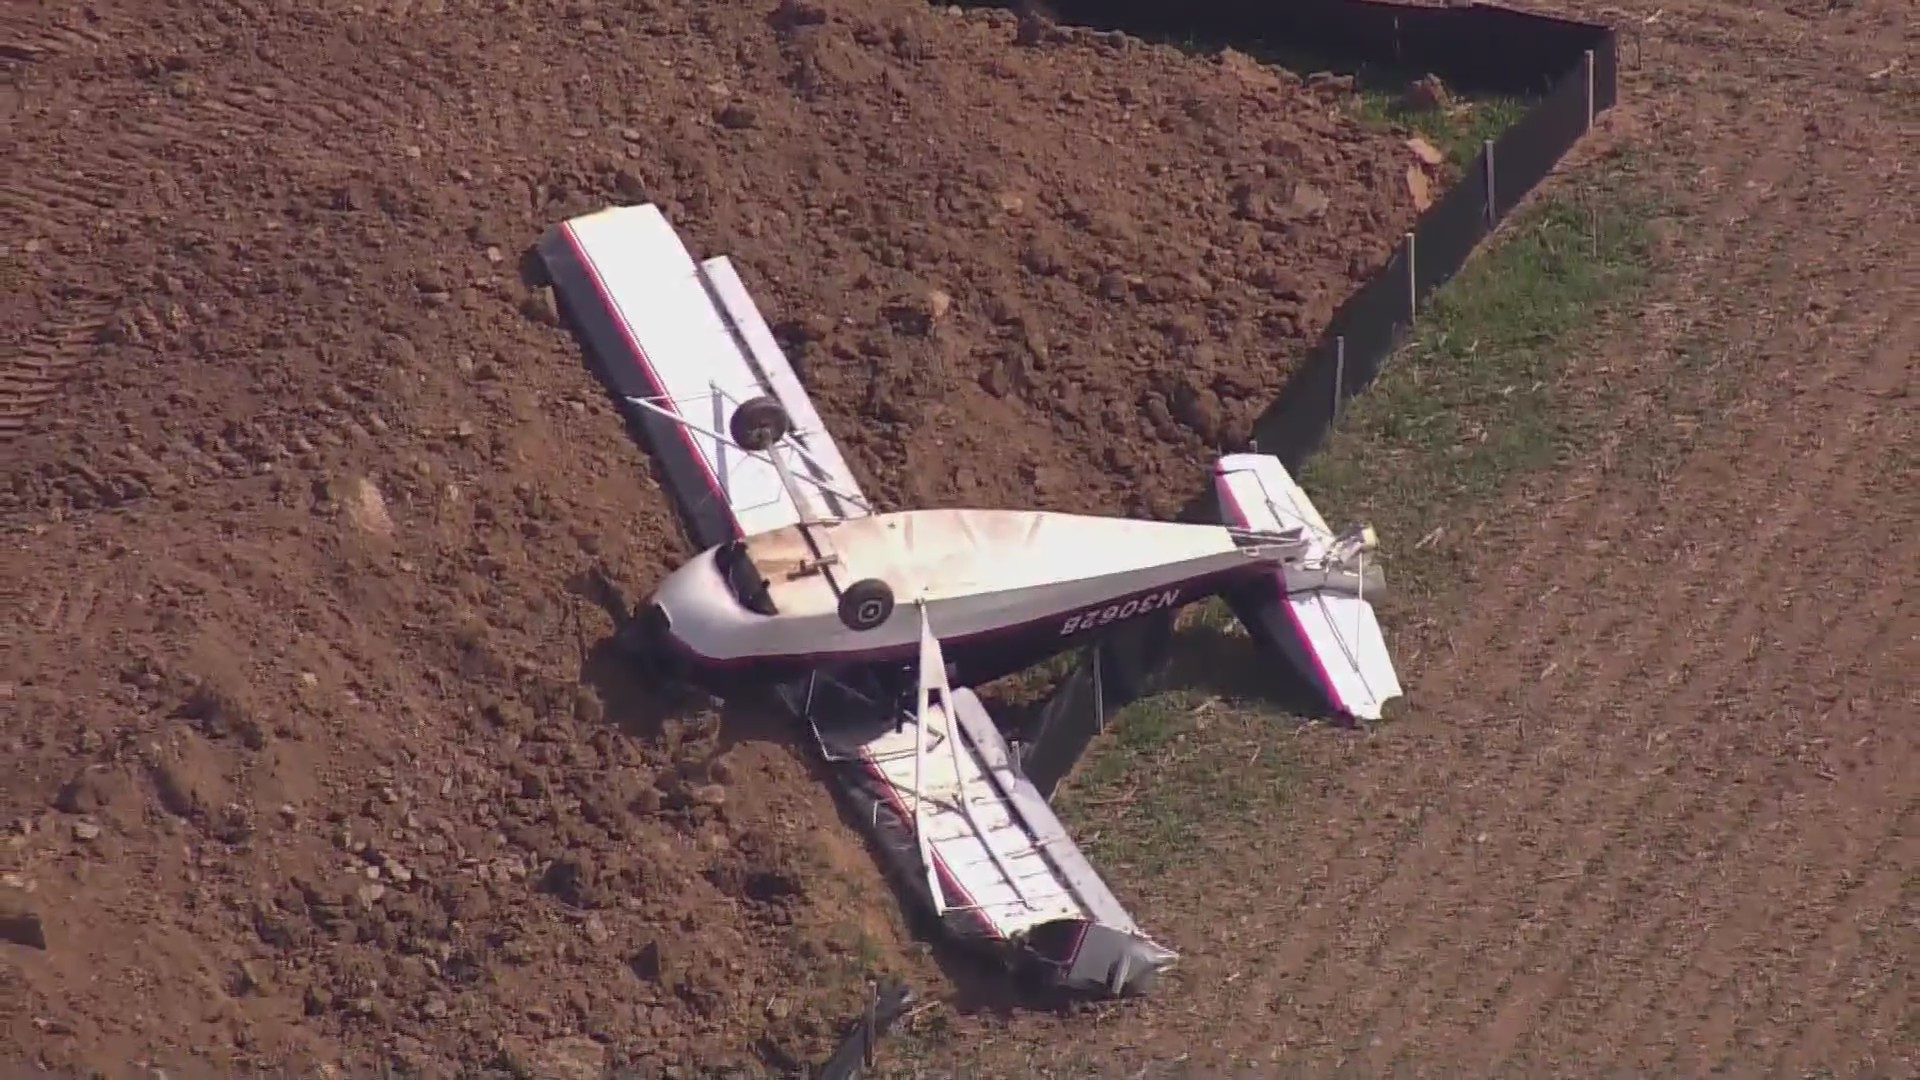 Frederick plane flip_1559857943019.jpg.jpg